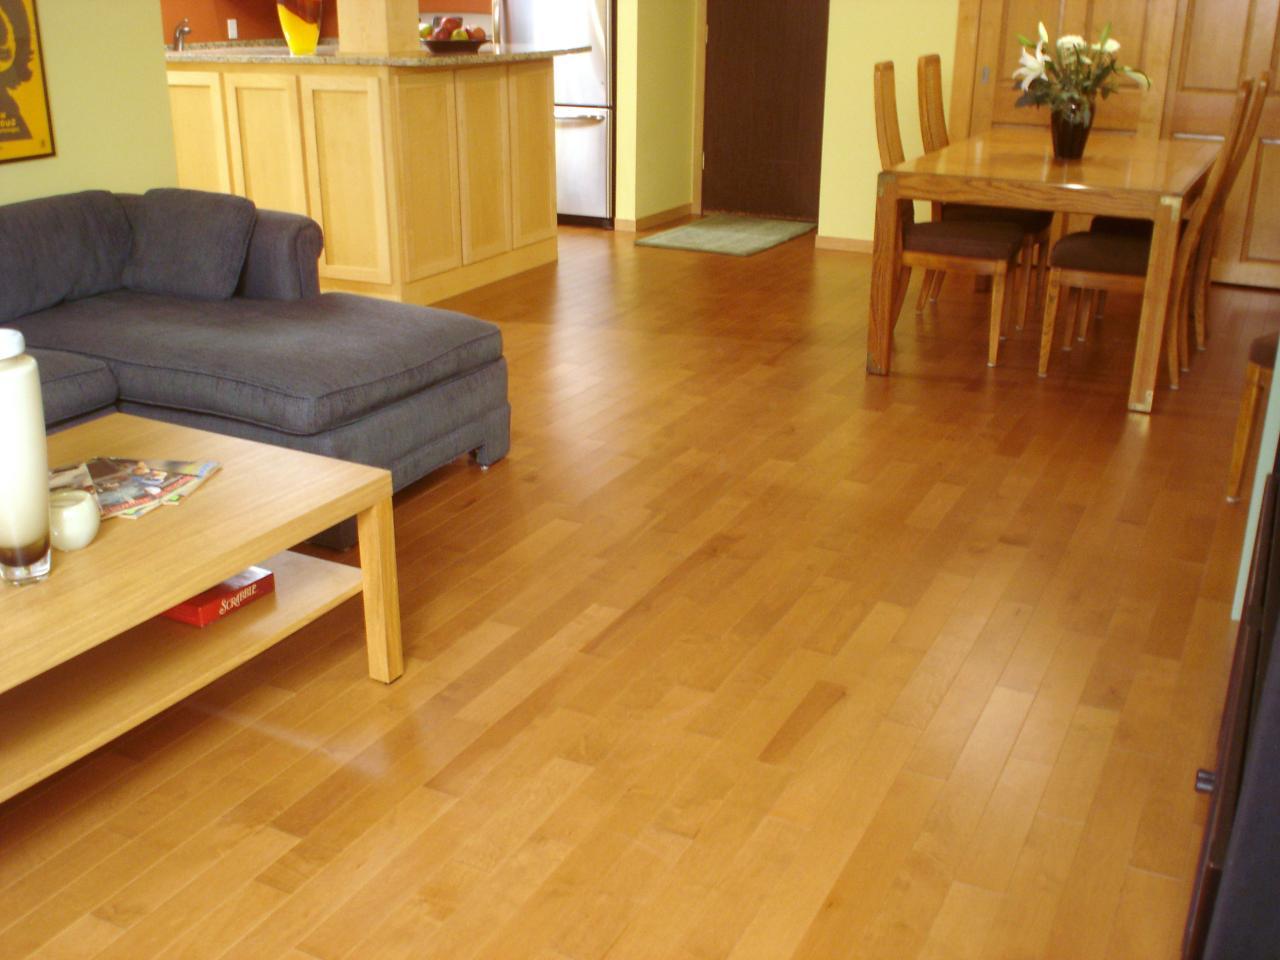 Tips before you start installing wood flooring diy for Installing 3 4 inch hardwood flooring